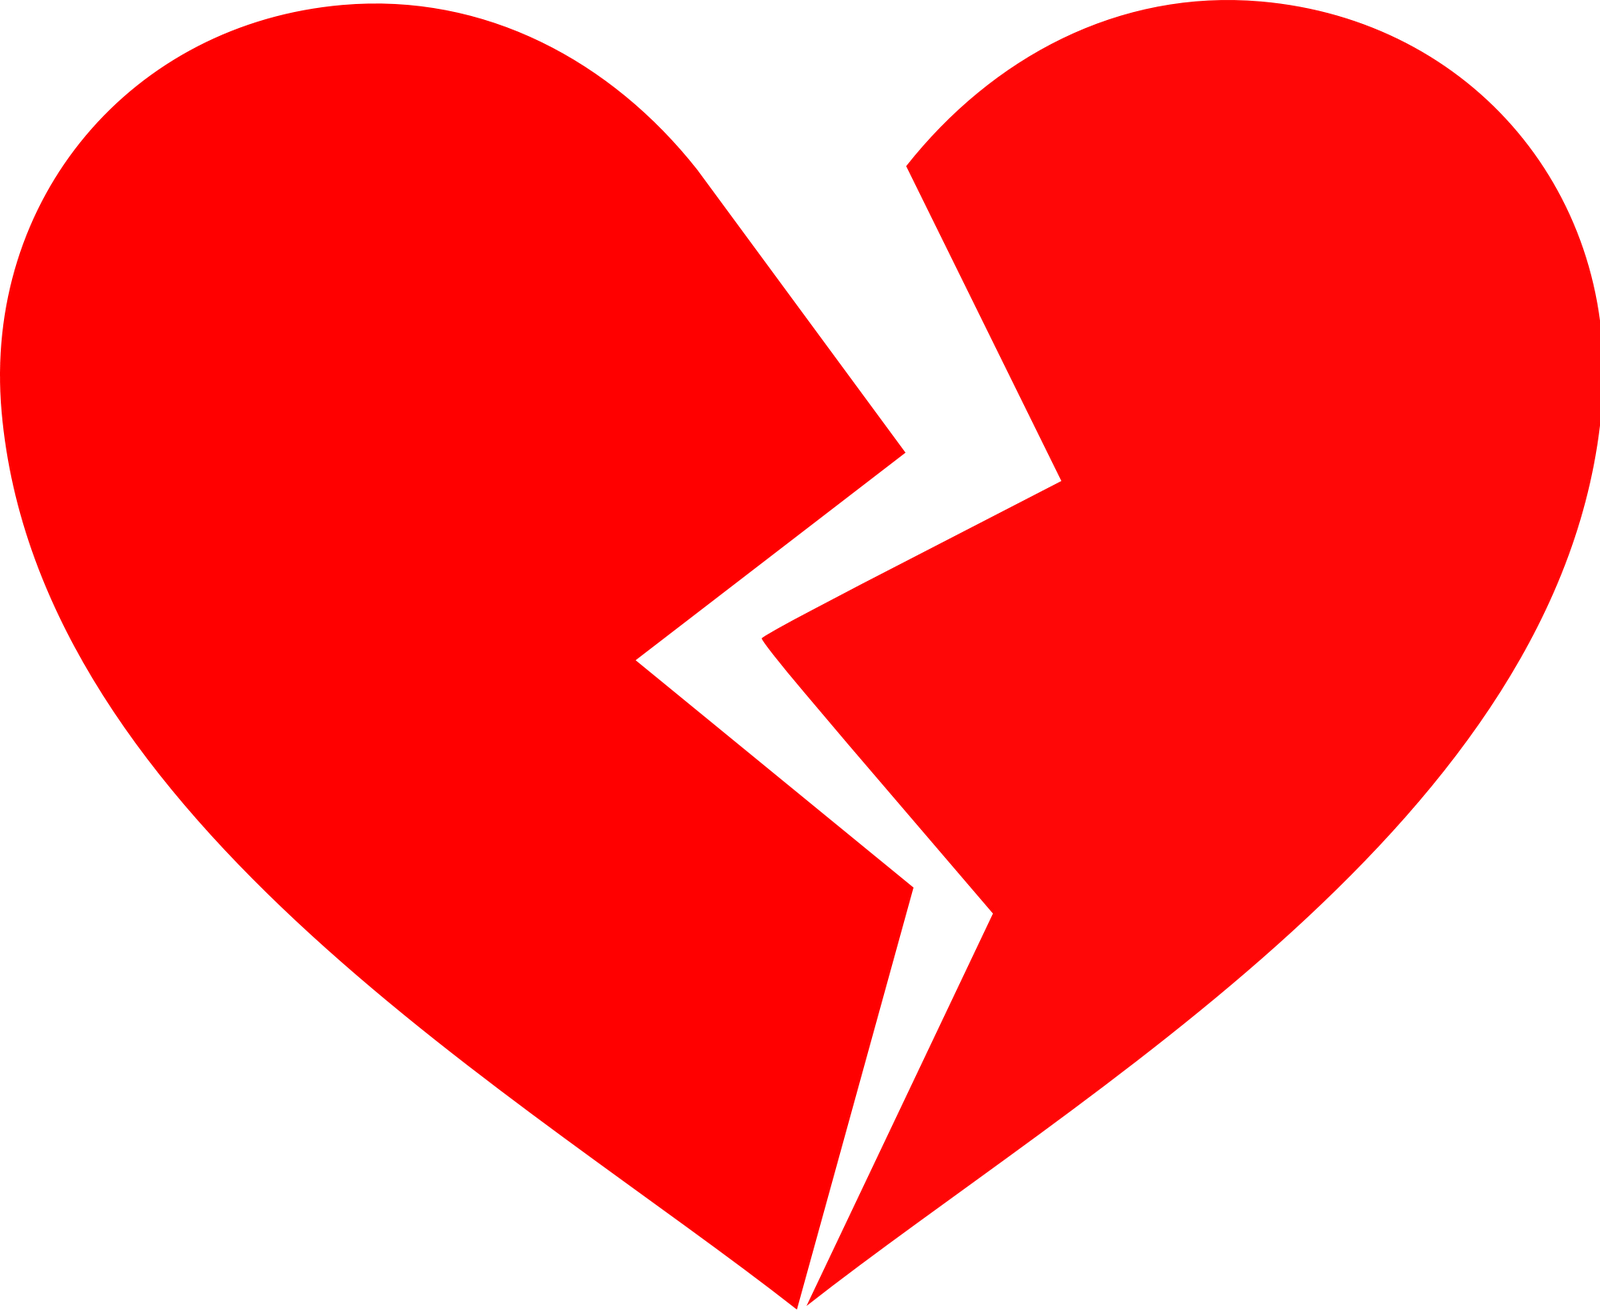 One heart clipart clip transparent Crissy A. Duarte | Lotus Hearts Club clip transparent